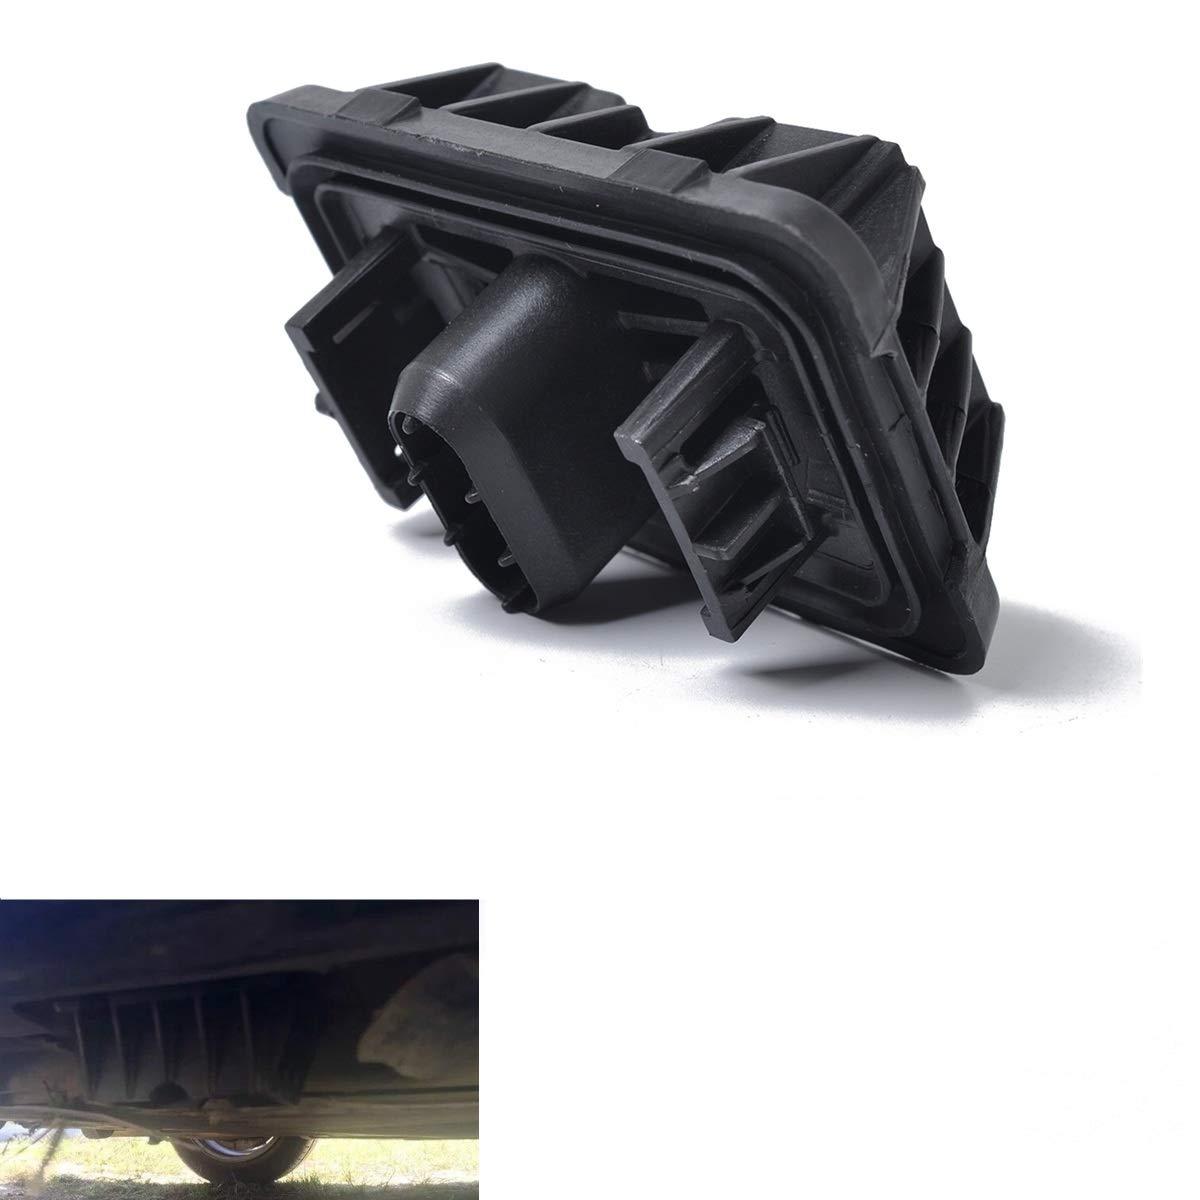 Rdash Dash Kit for Lincoln Mark VIII 1993-1996 Auto Interior Decal Trim